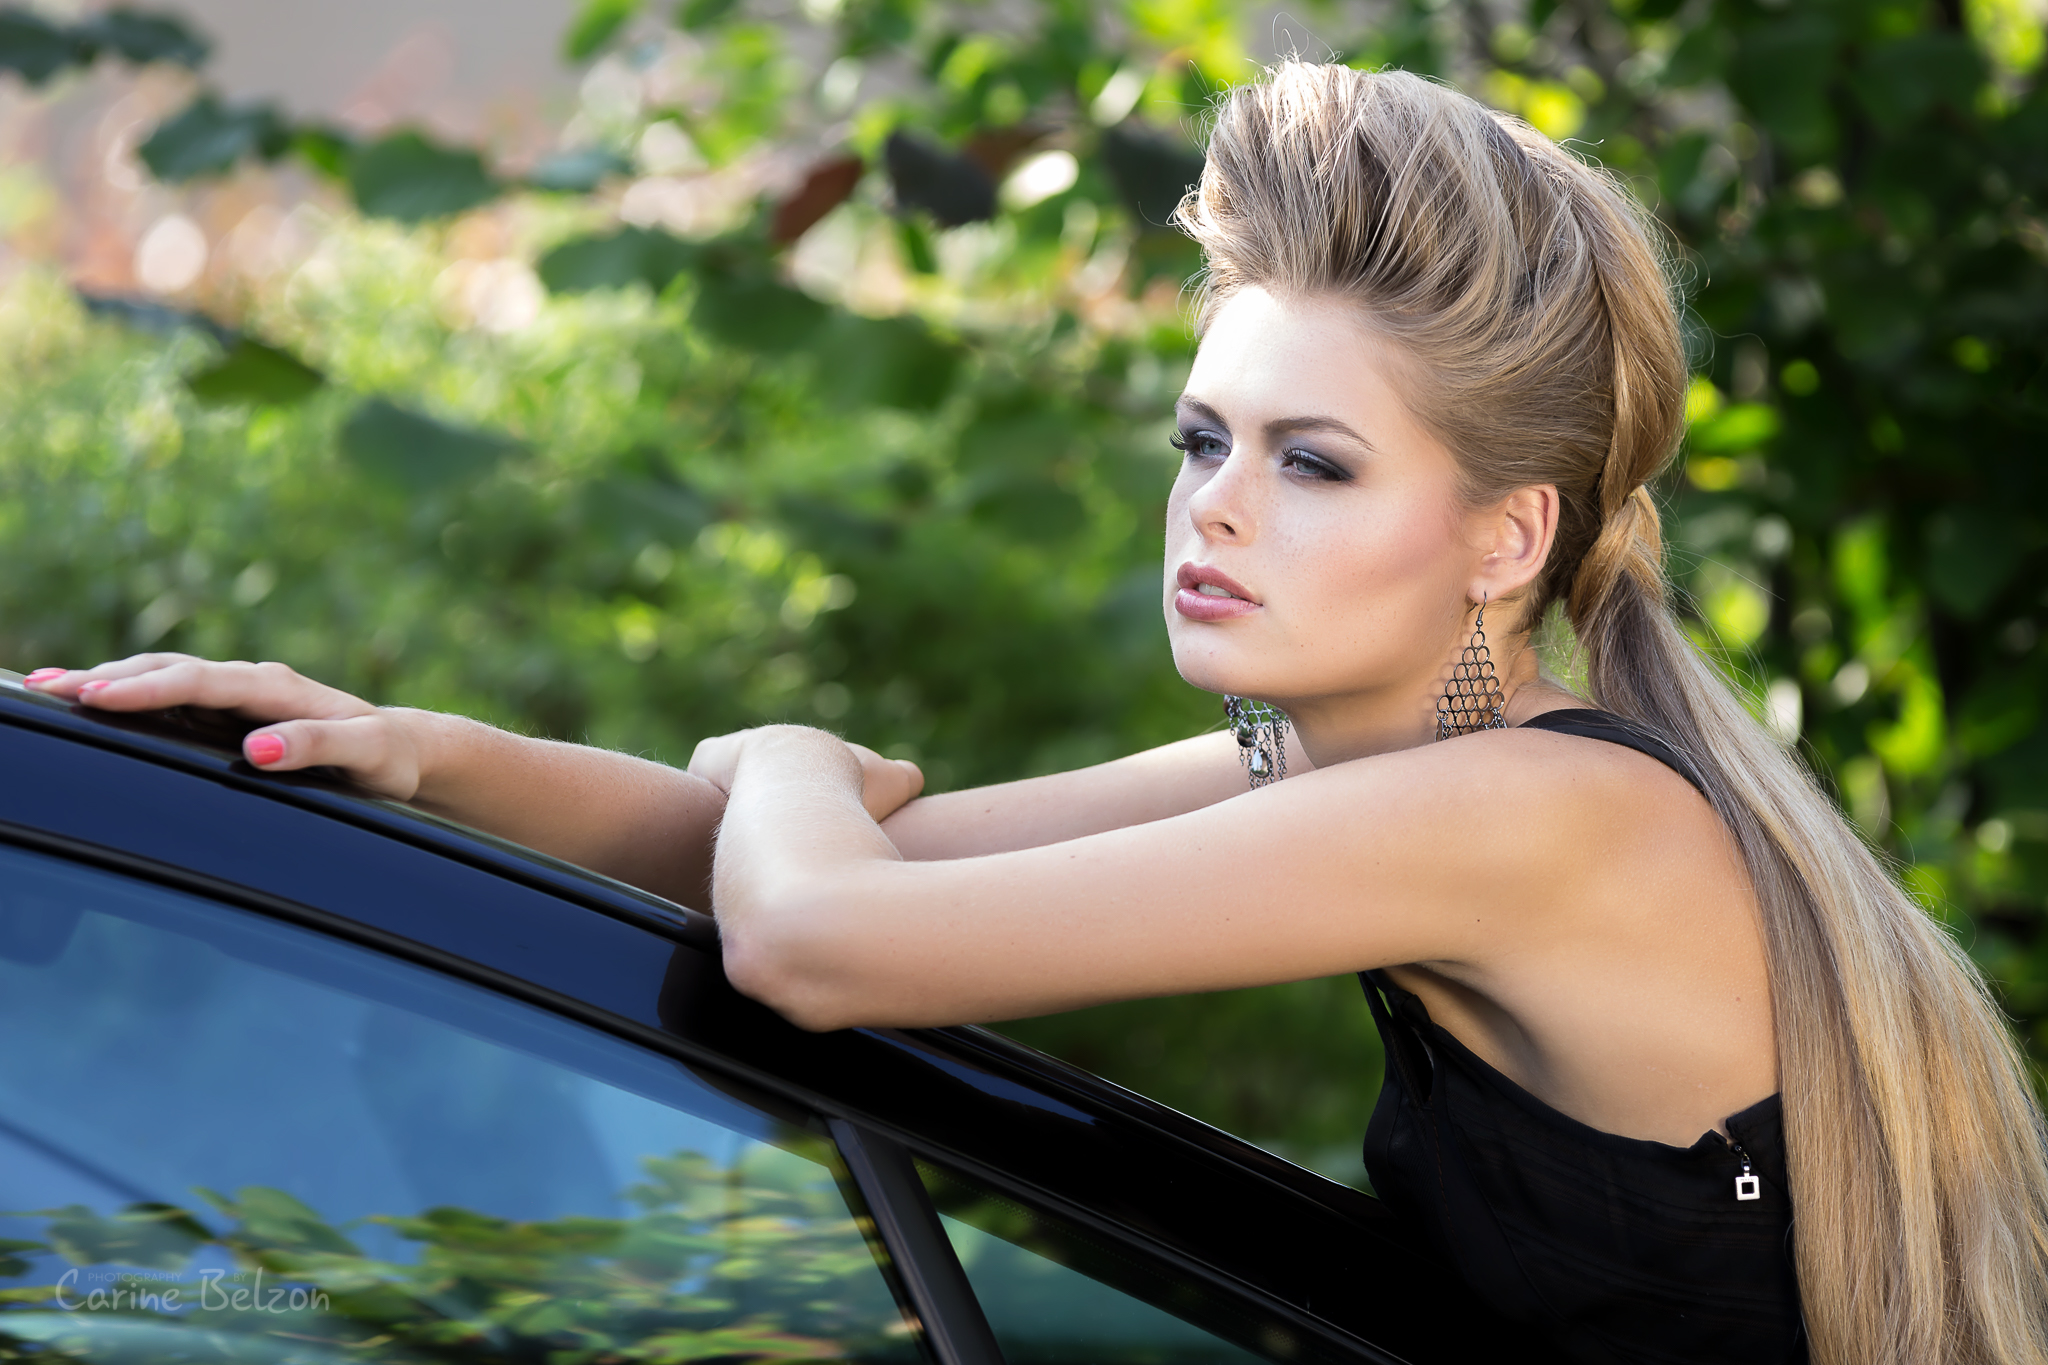 Portfolio - Portret - Carine Belzon Fotografie